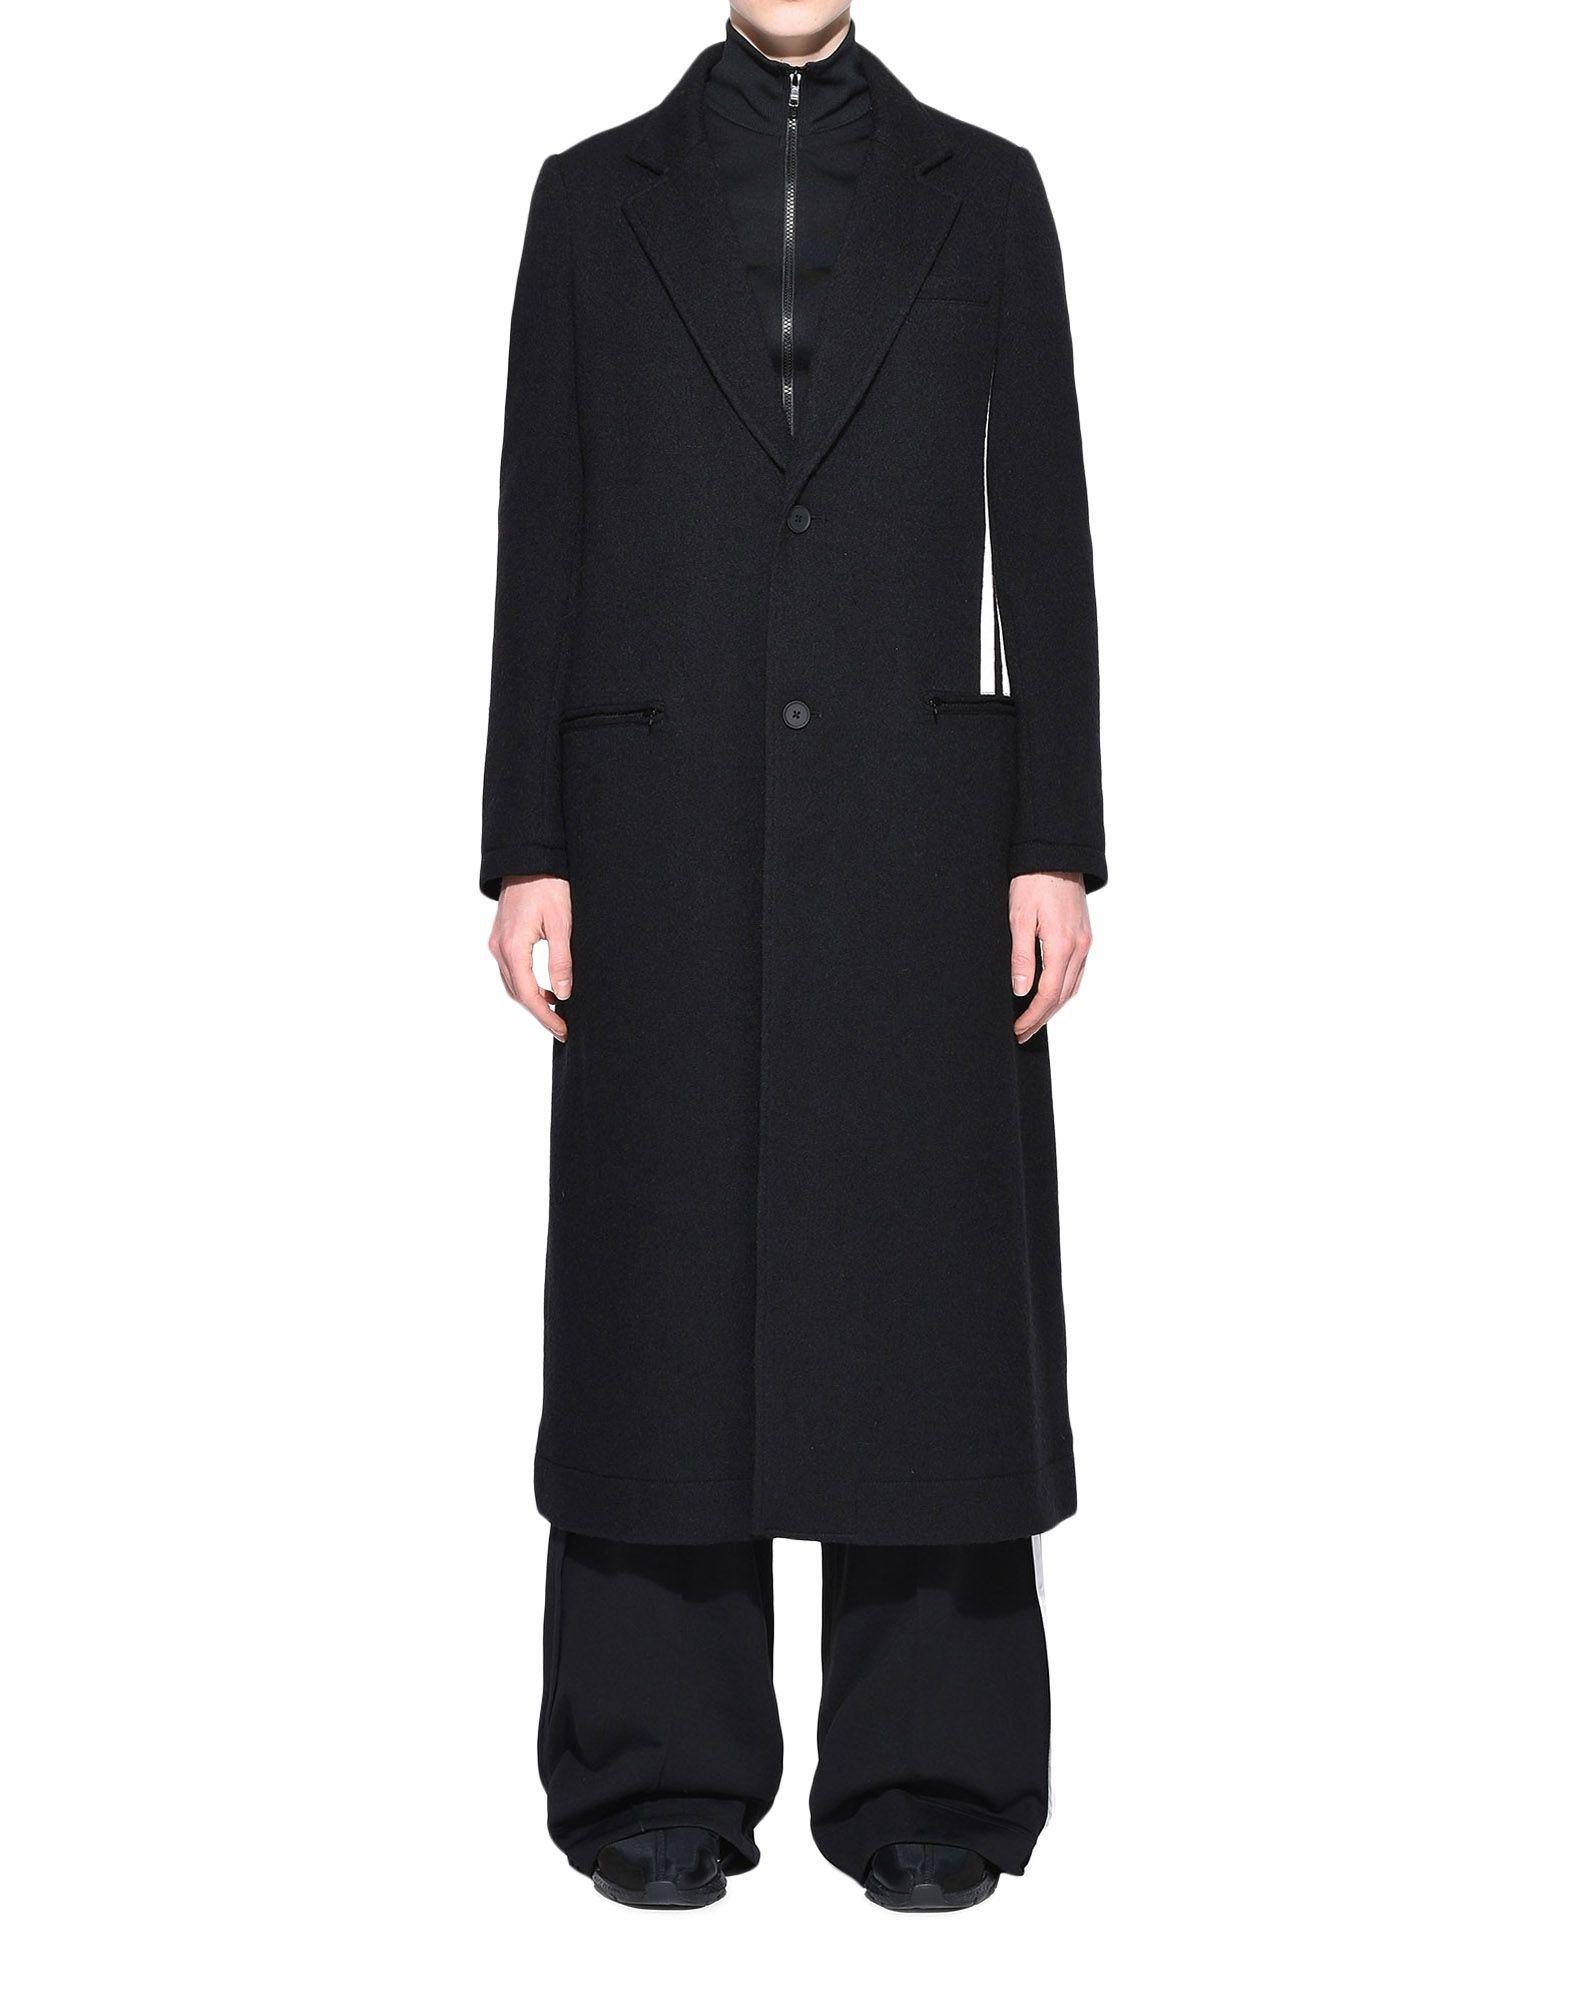 Y-3 Y-3 3-Stripes Tailored Wool Coat フォーマルジャケット レディース r